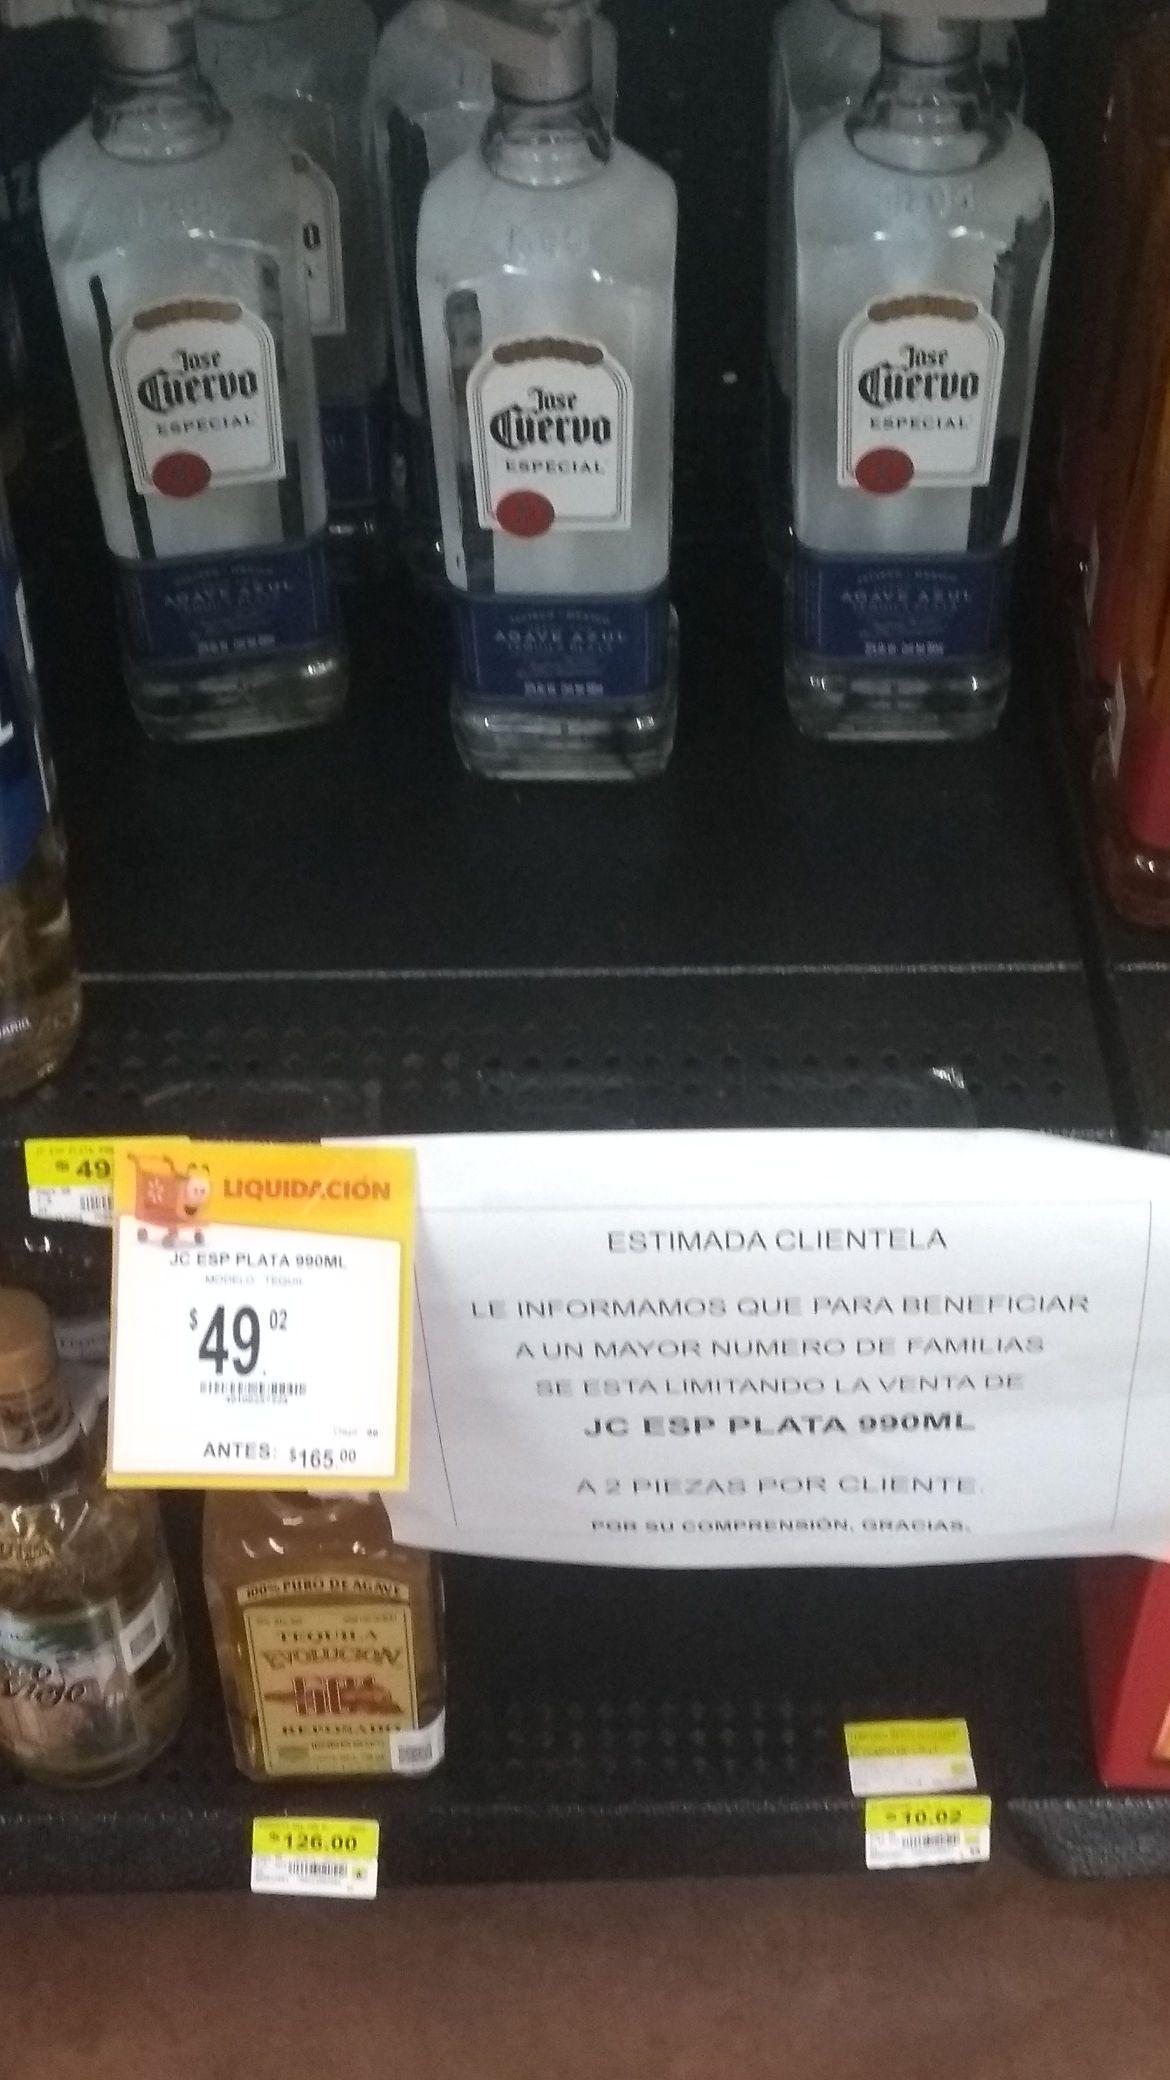 Walmart Poza Rica tequila José Cuervo de 990 ml